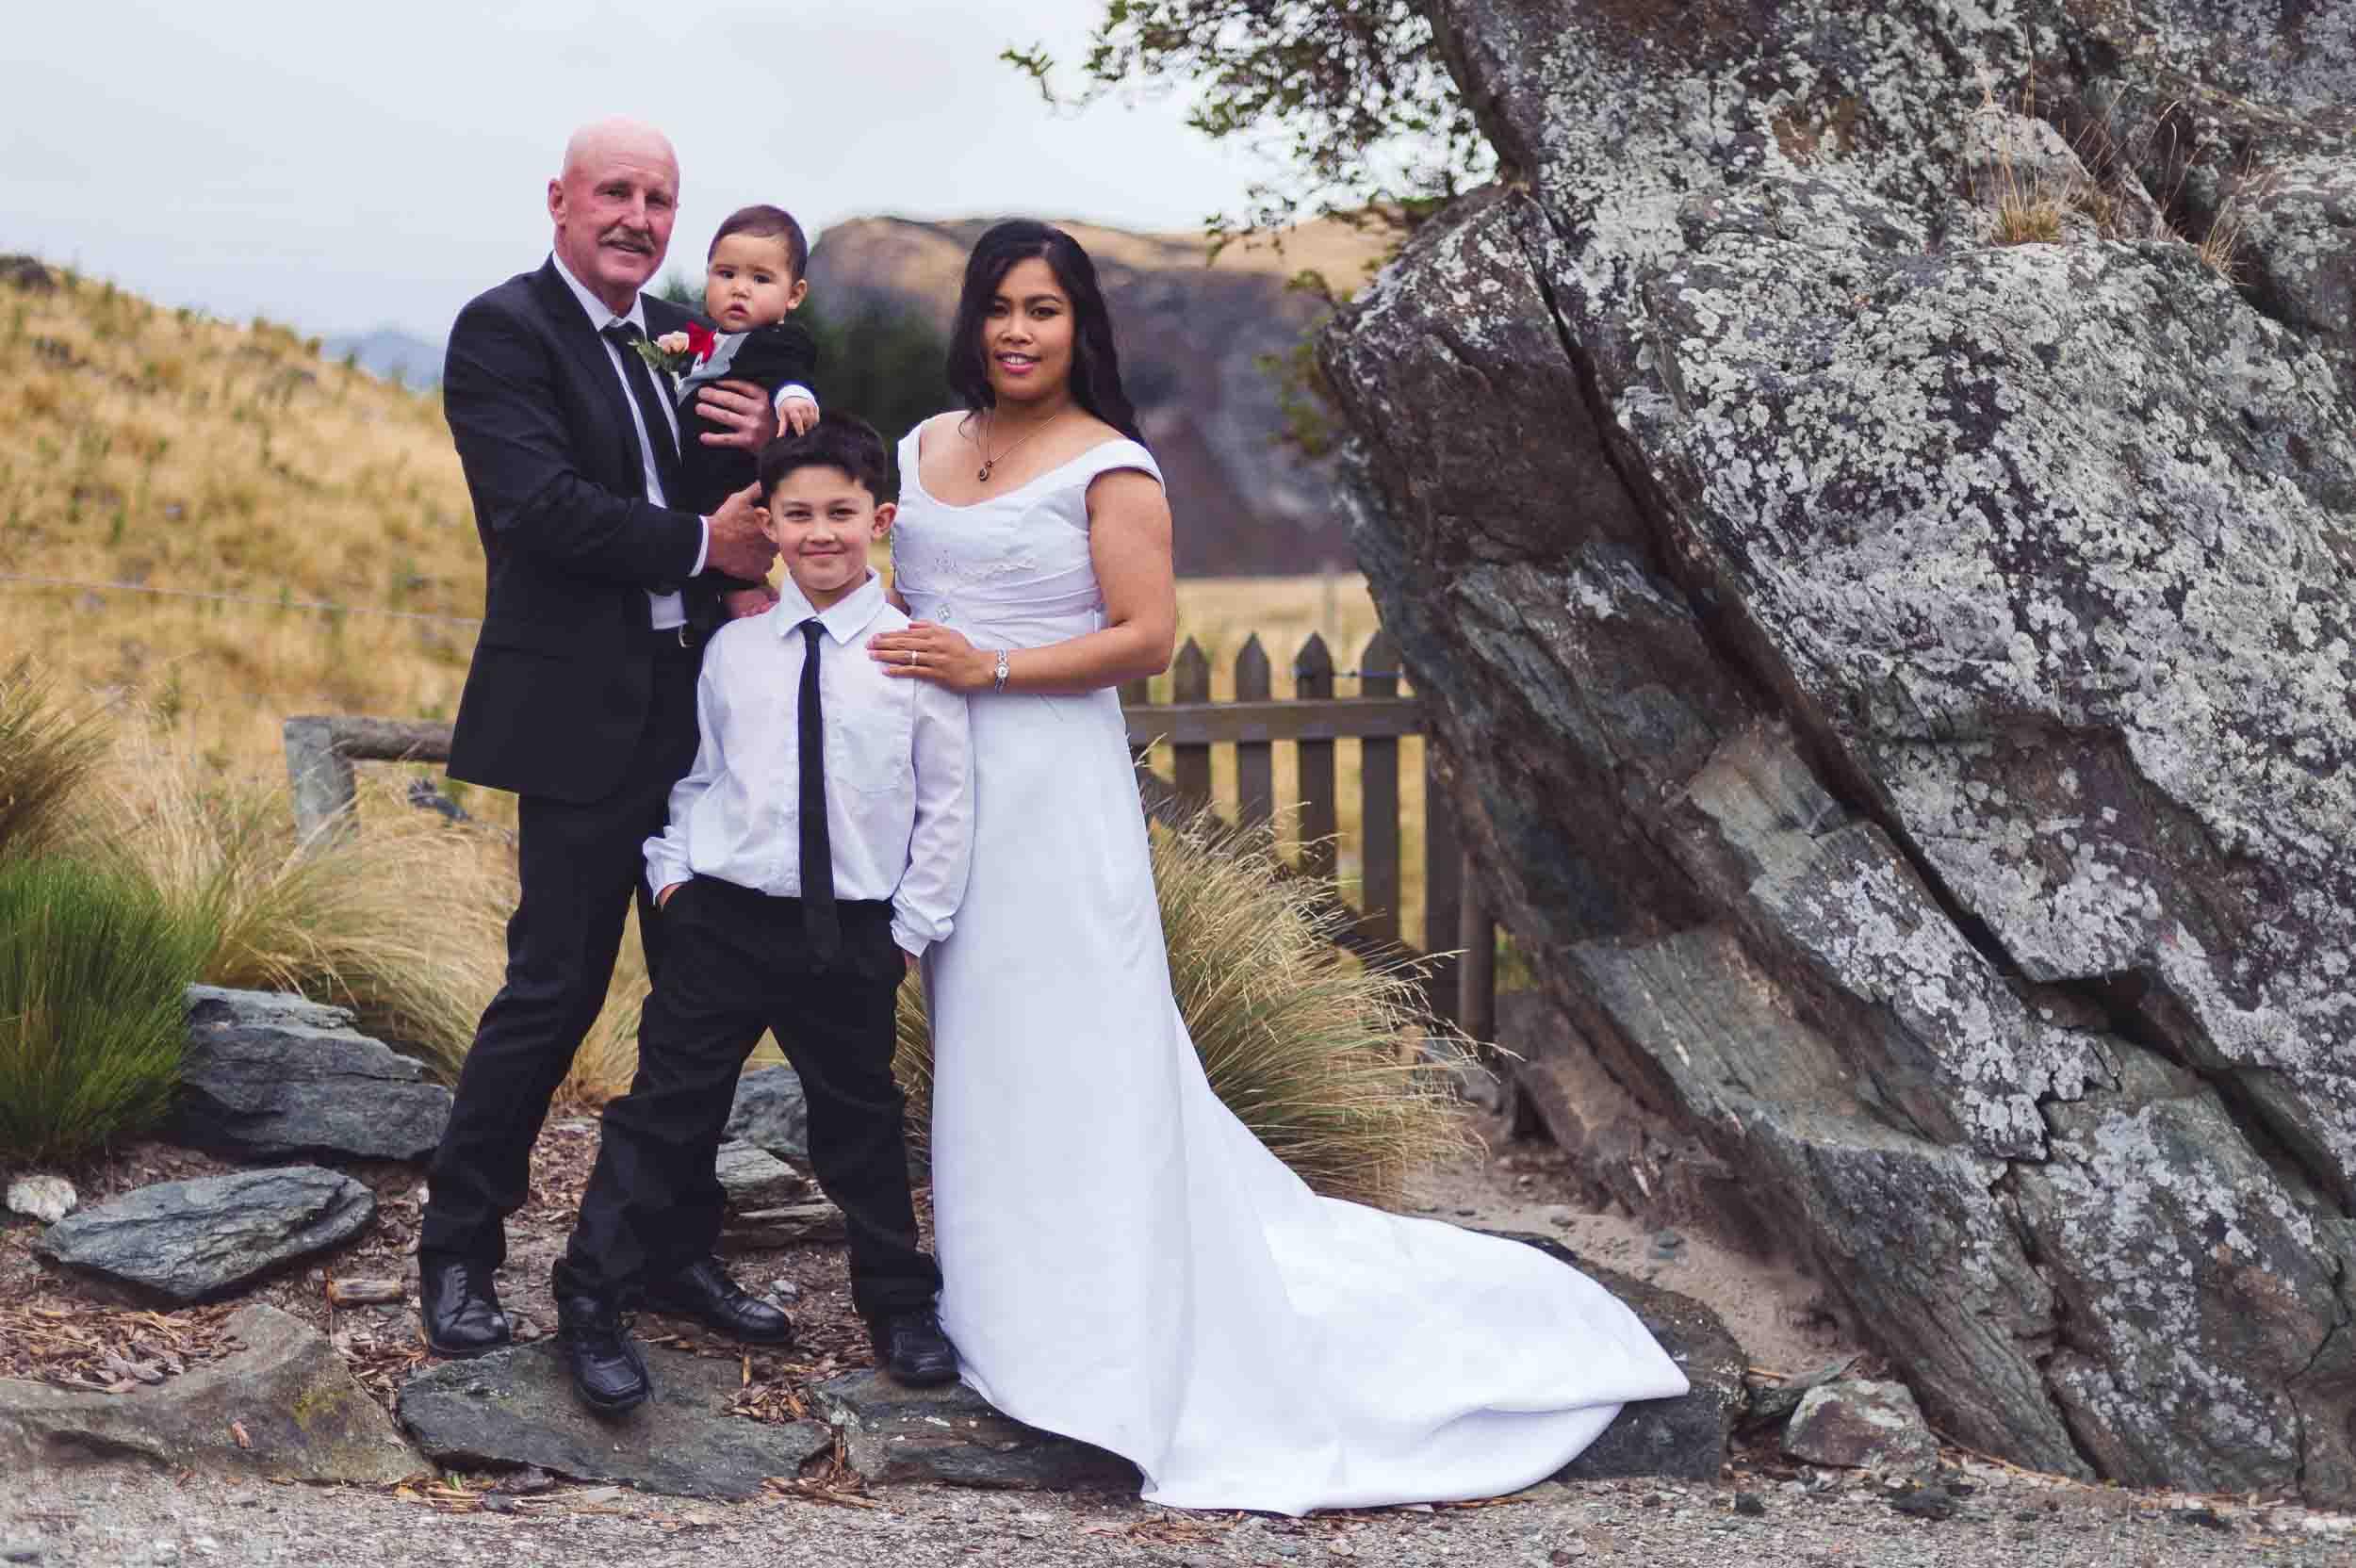 blog post featured image Greg + May | Backyard Gibbston Valley Wedding fallon photography